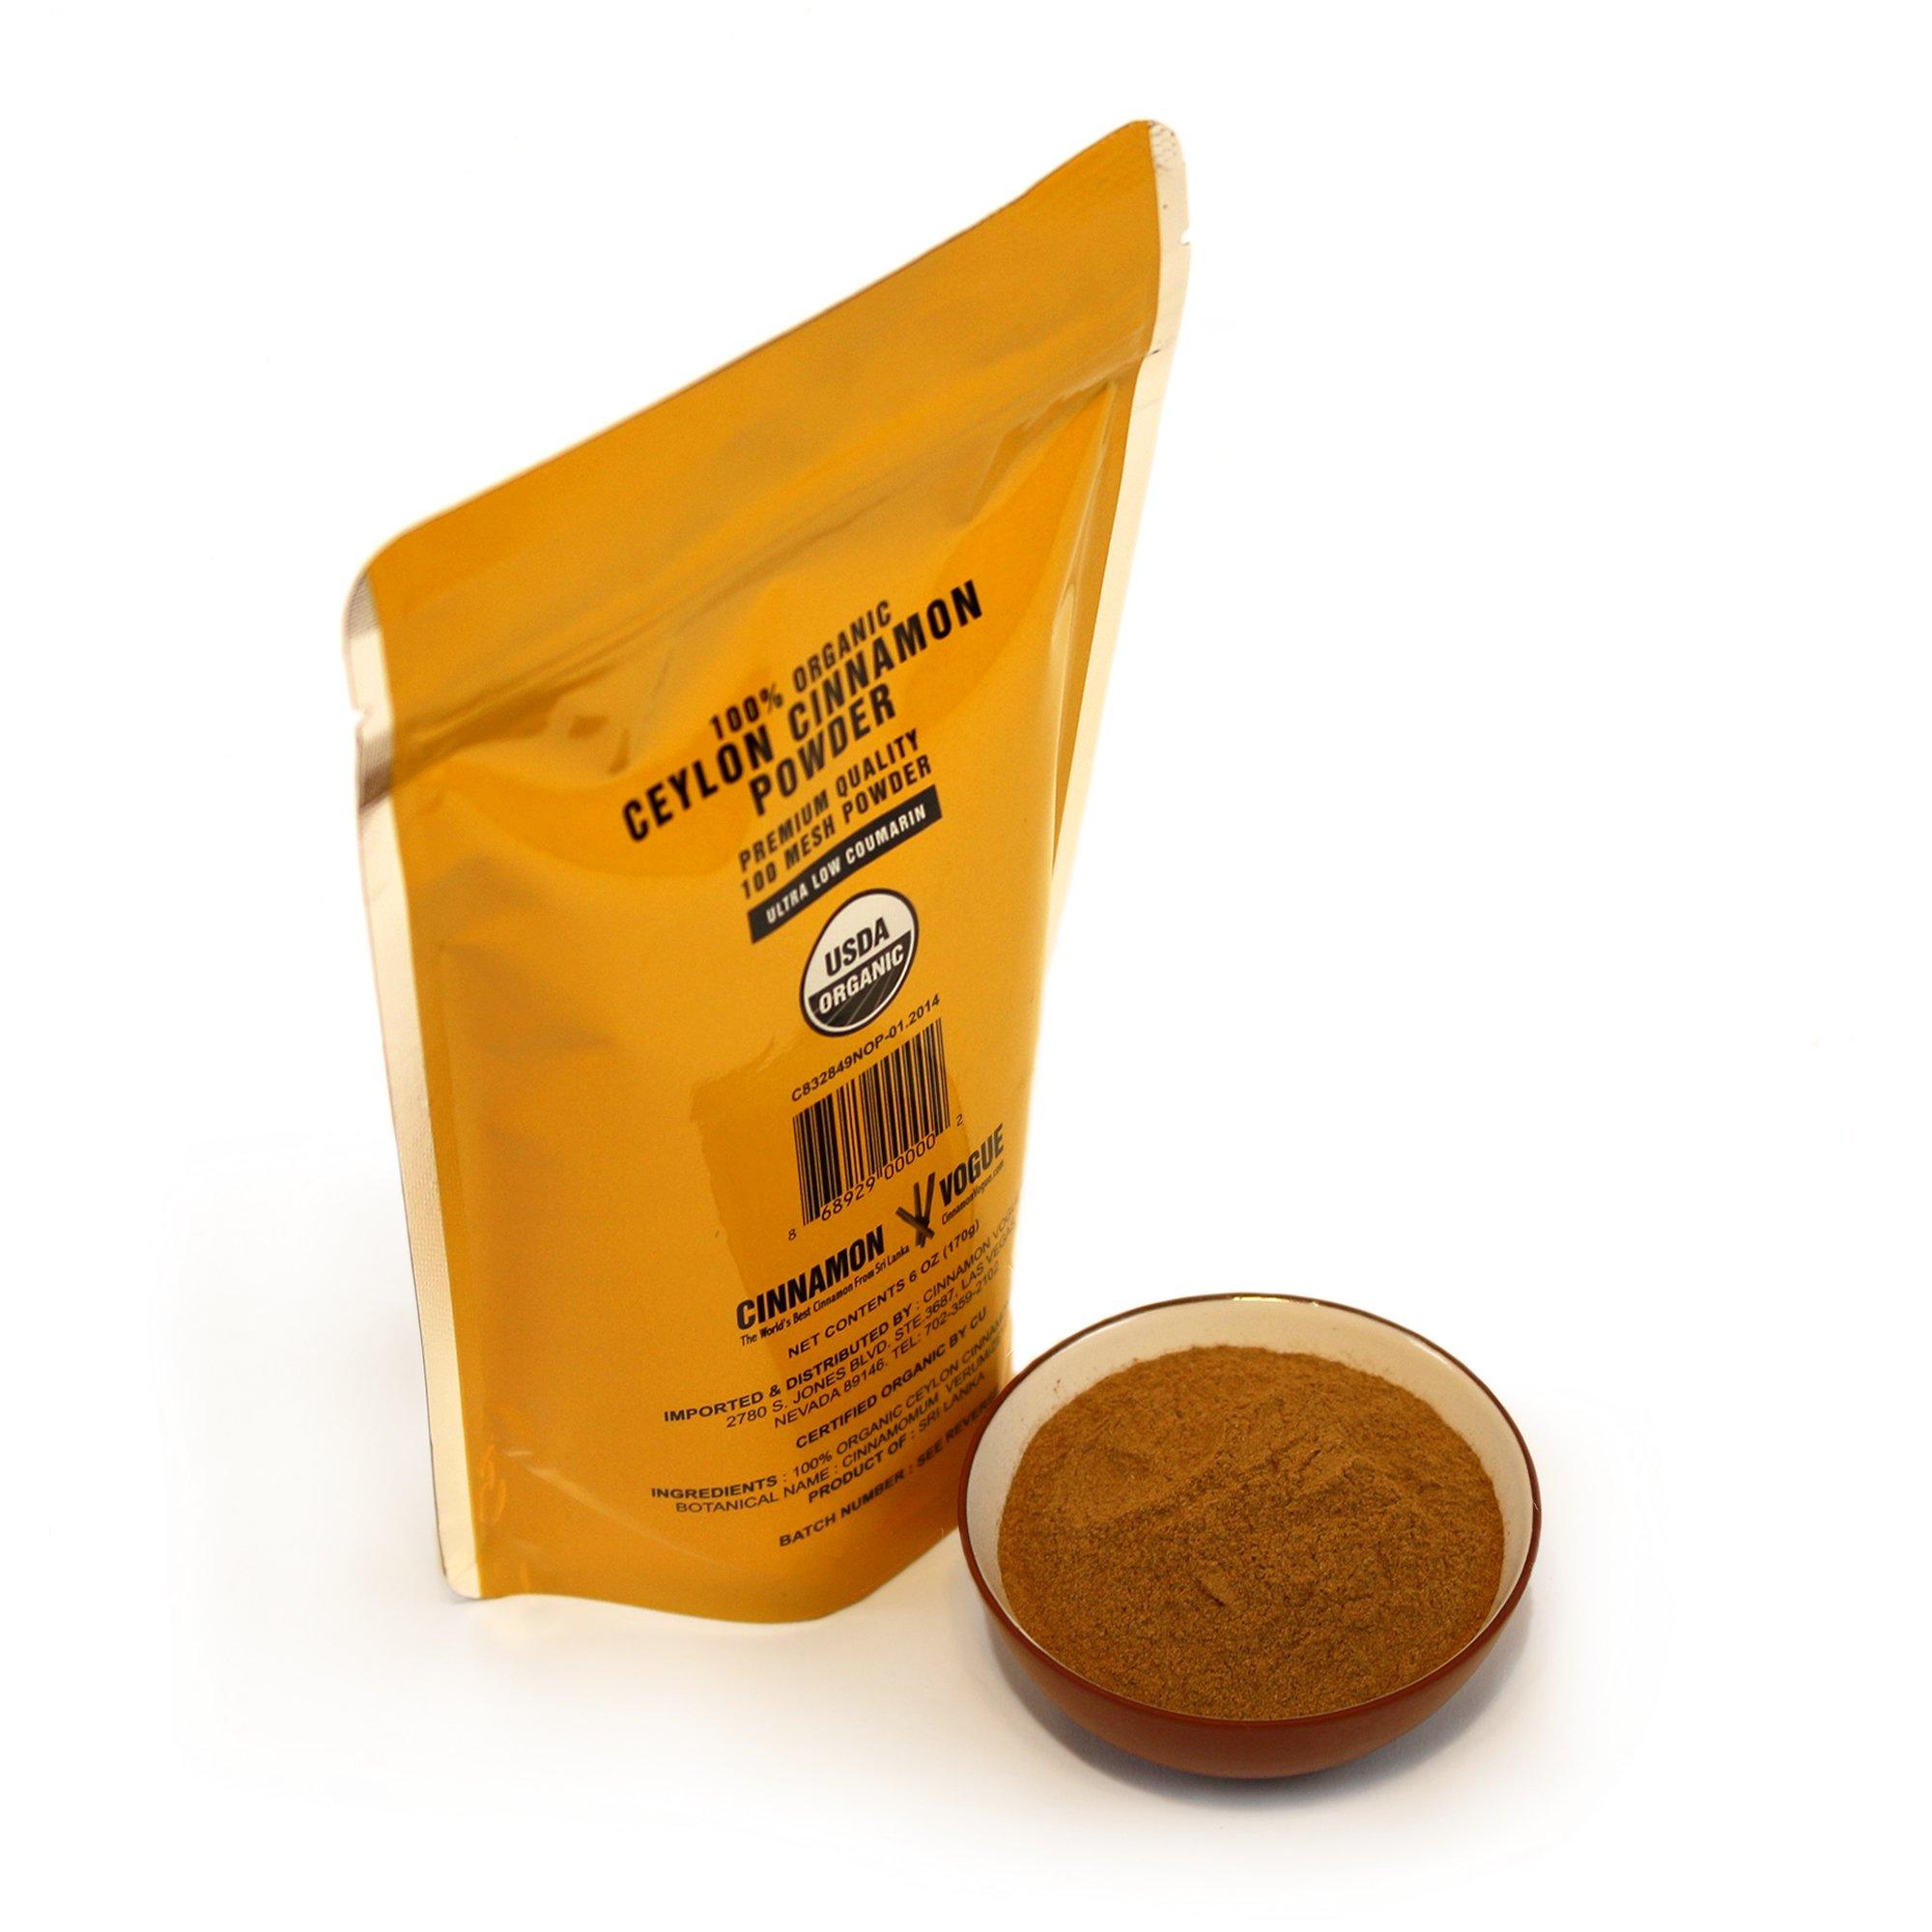 Ceylon Cinnamon Powder – 6 oz. (100% USDA Organic) - Ultra Premium Fine 100 Mesh Powder, Salt Free, Non irradiated, Low Coumarin by Cinnamon Vogue (Image #4)